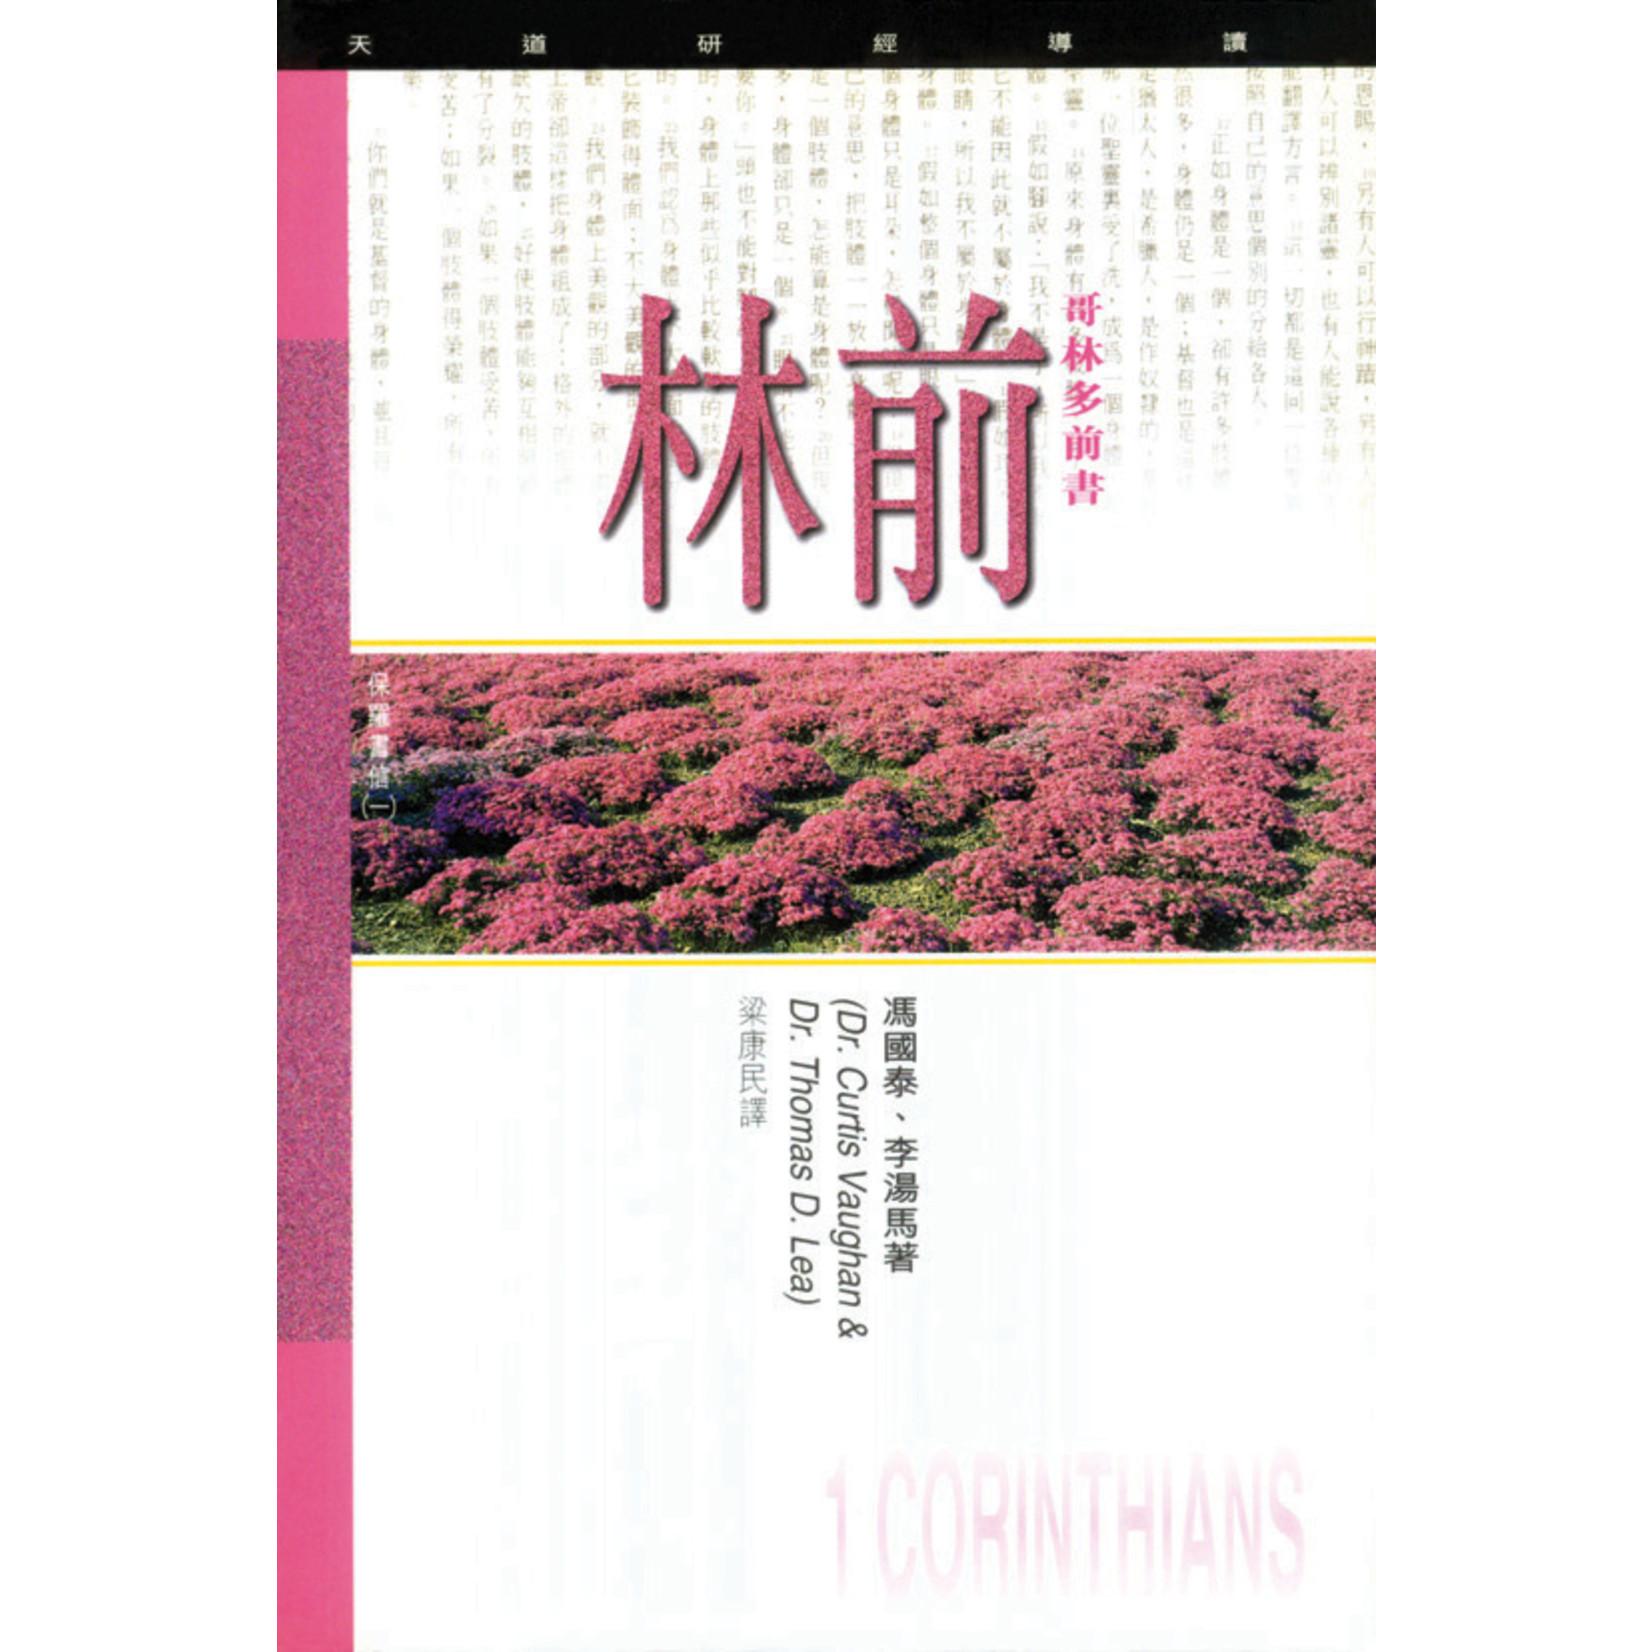 天道書樓 Tien Dao Publishing House 天道研經導讀:哥林多前書